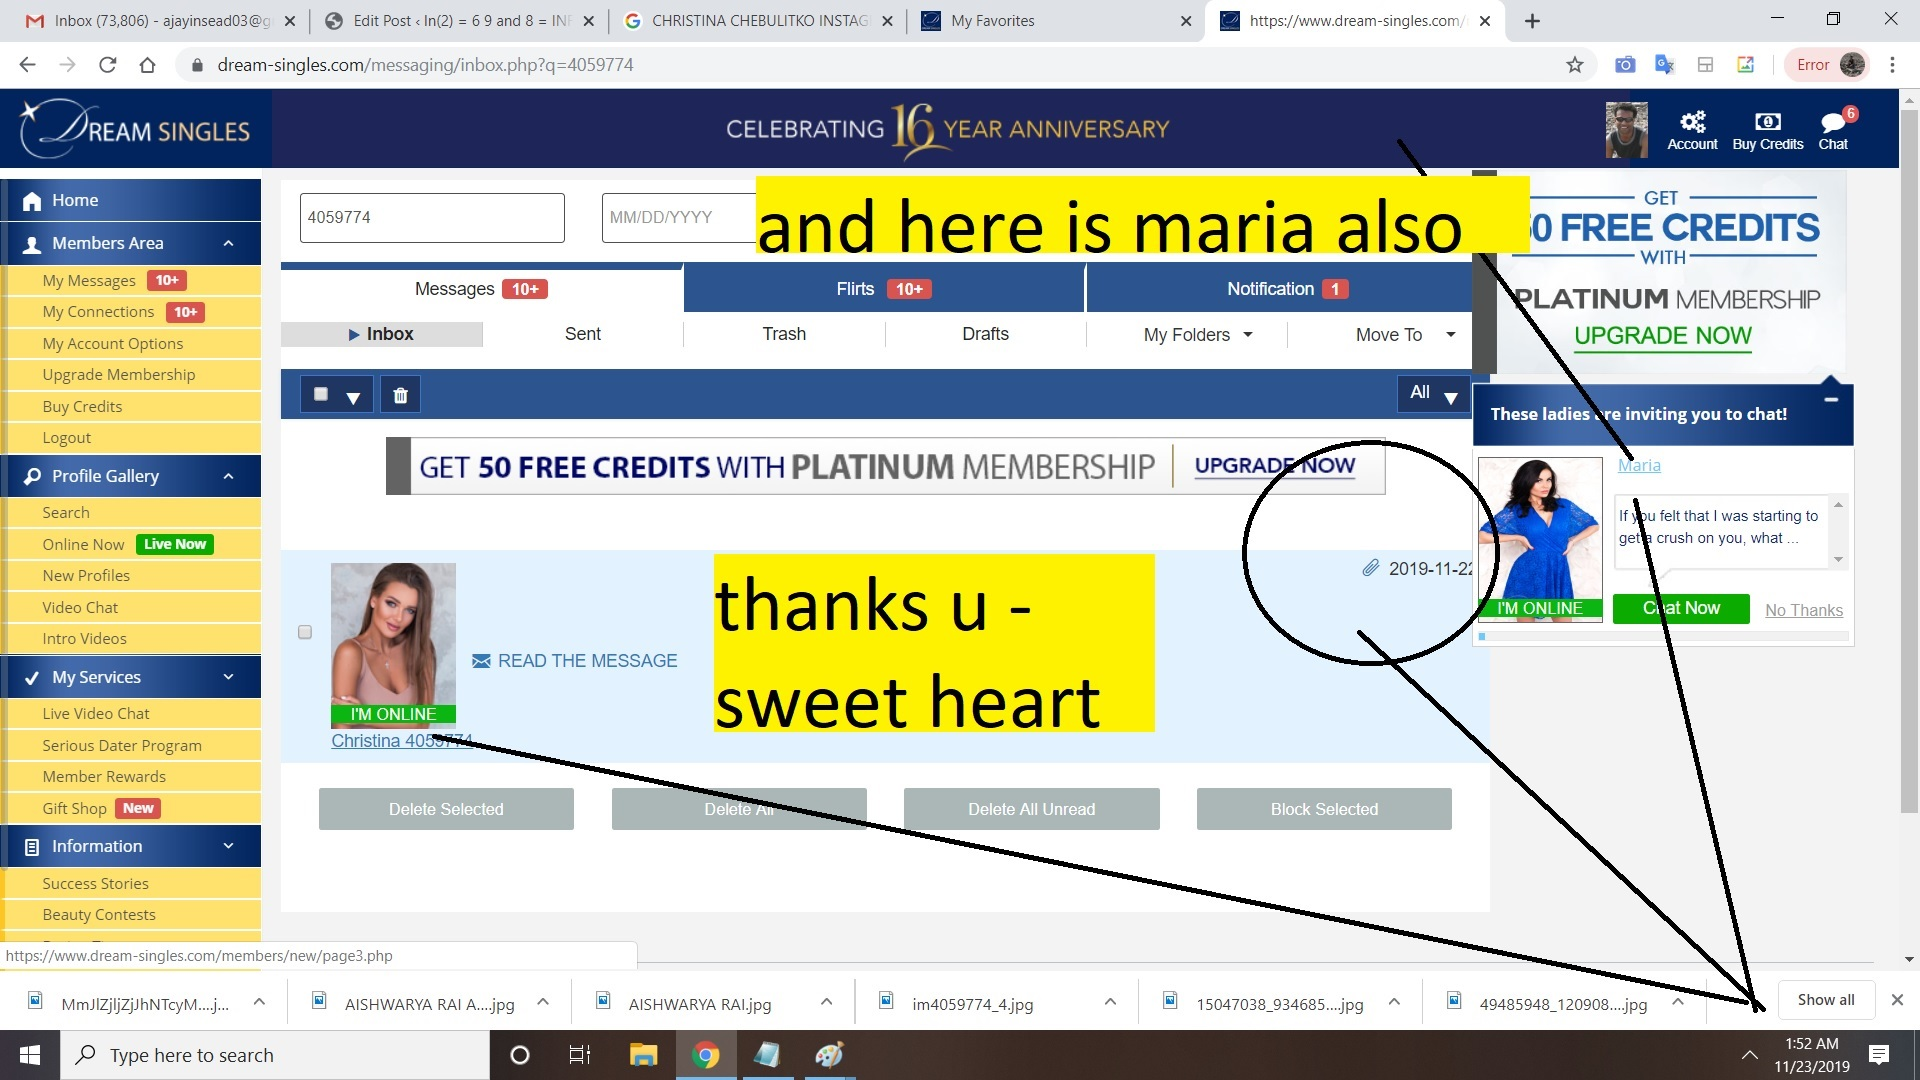 christiana - thanks